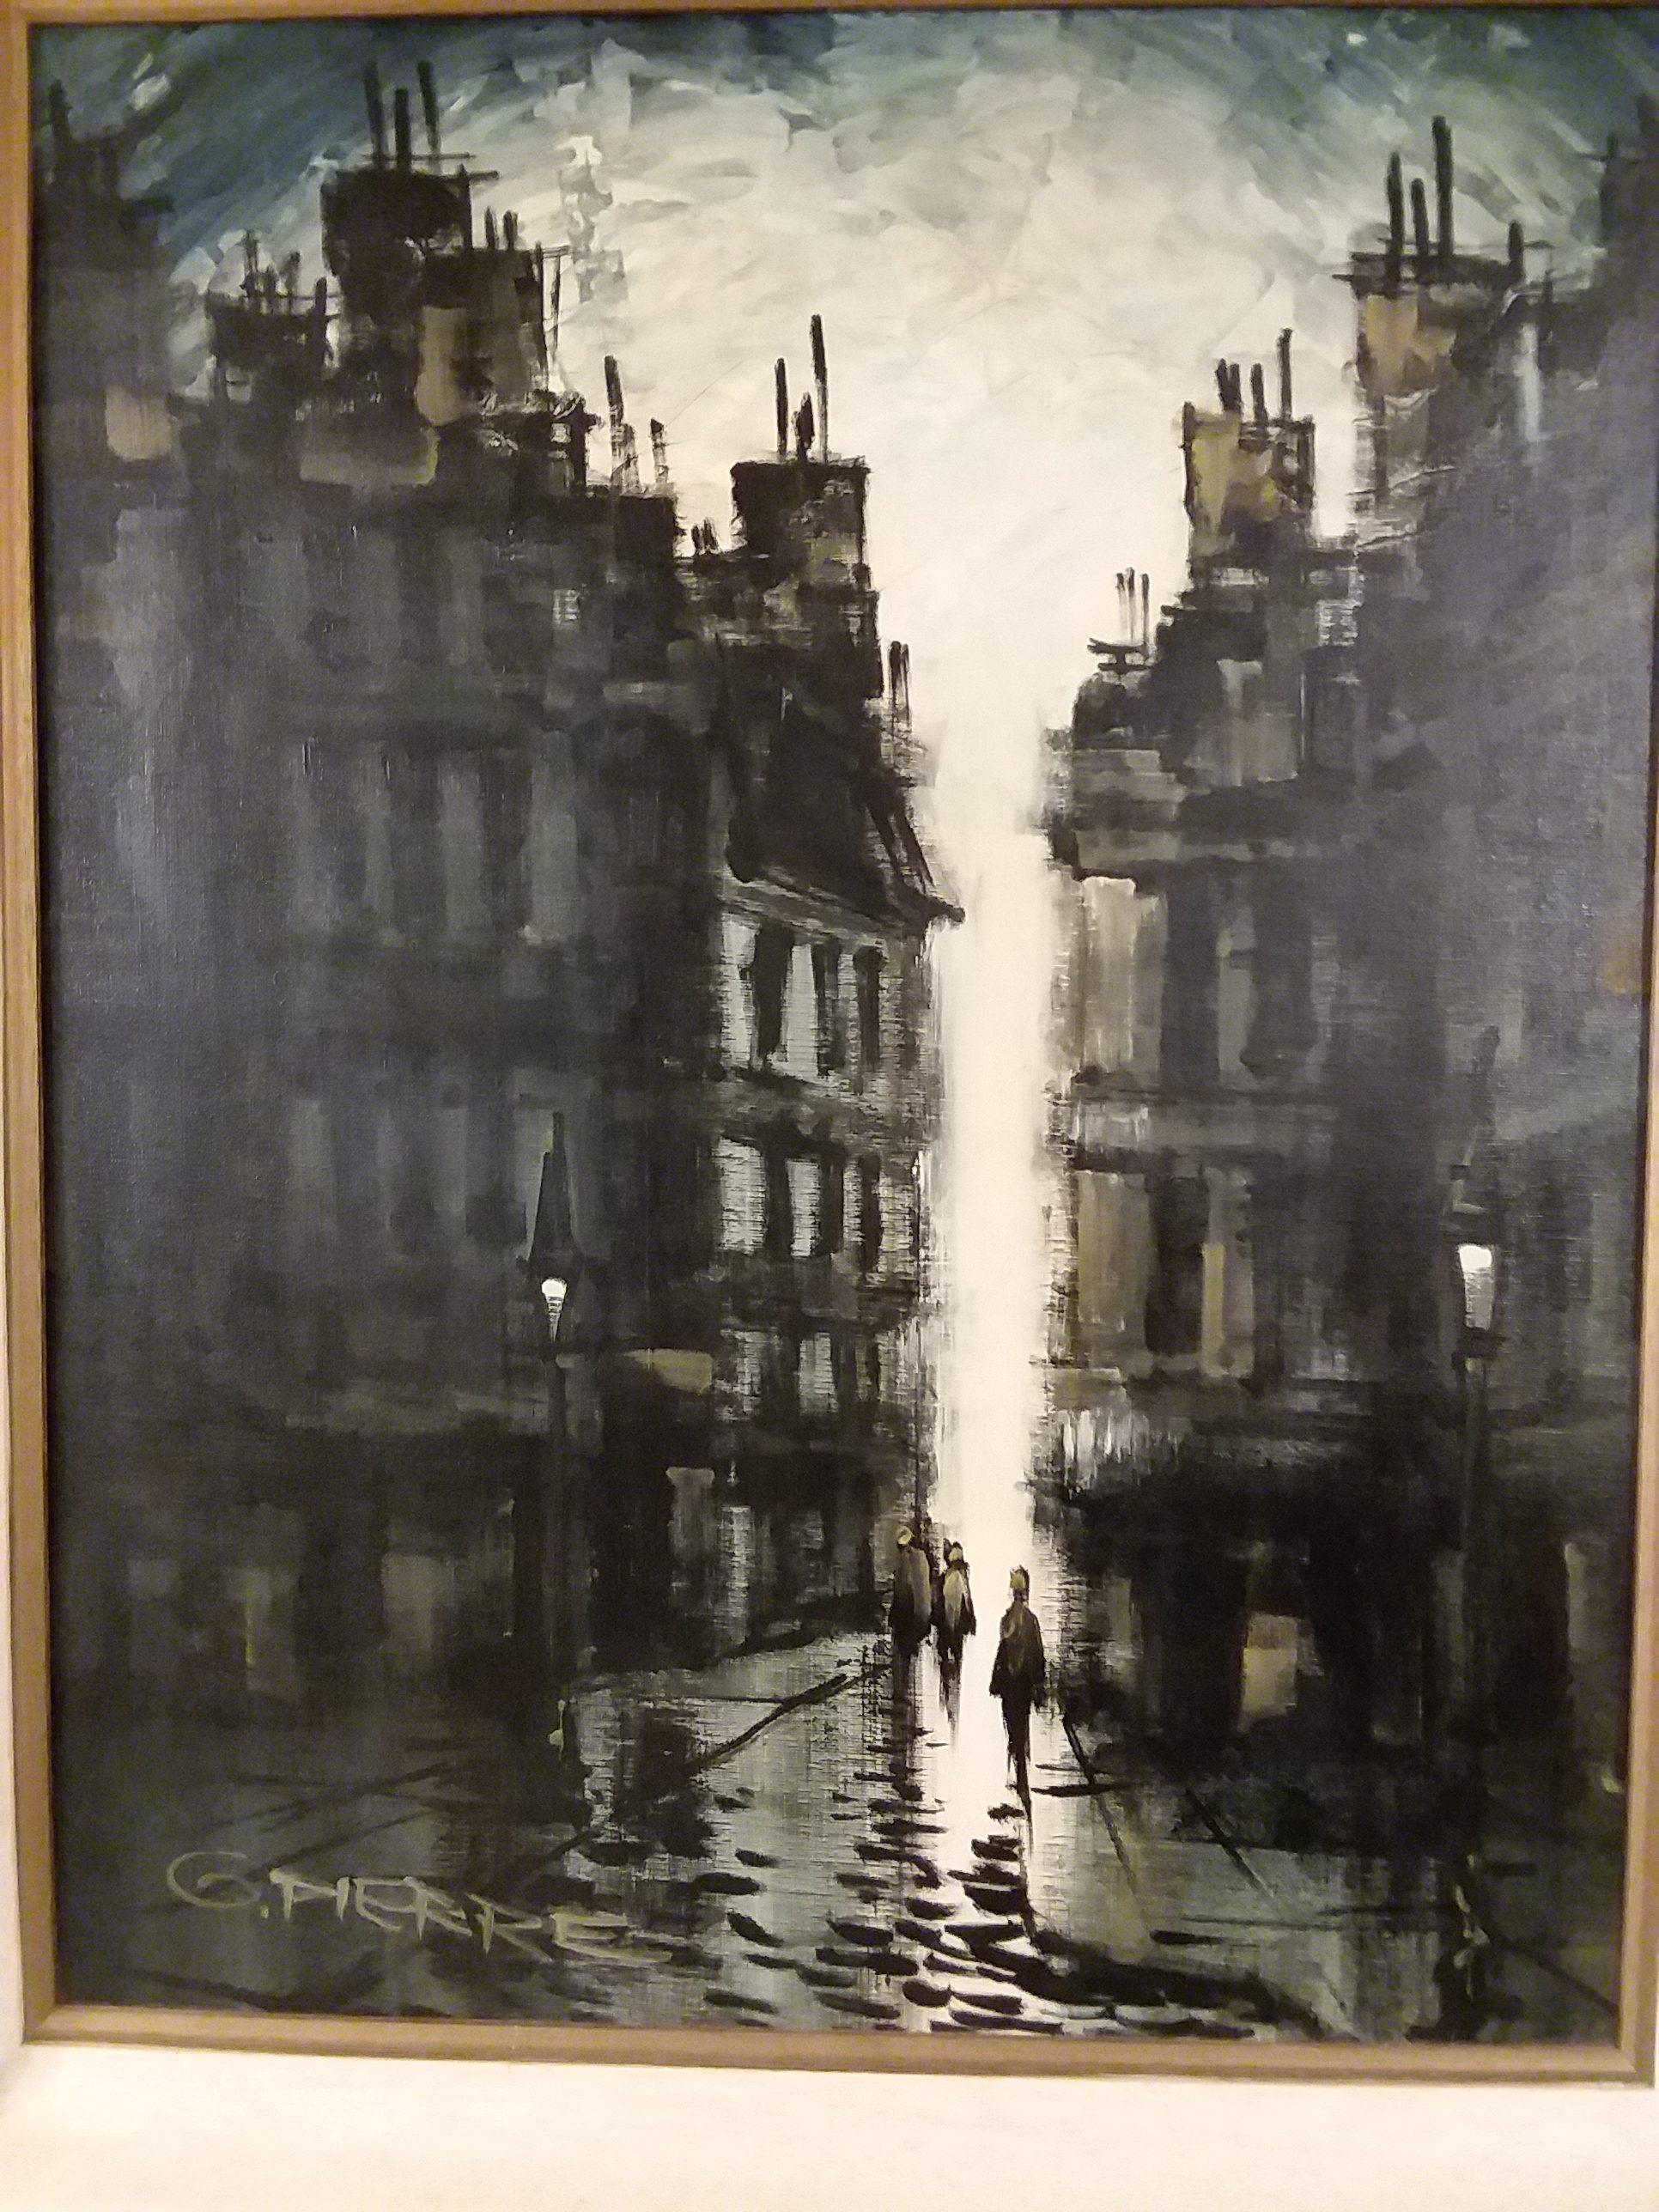 Gaston pierre impressionist paris street scene painting